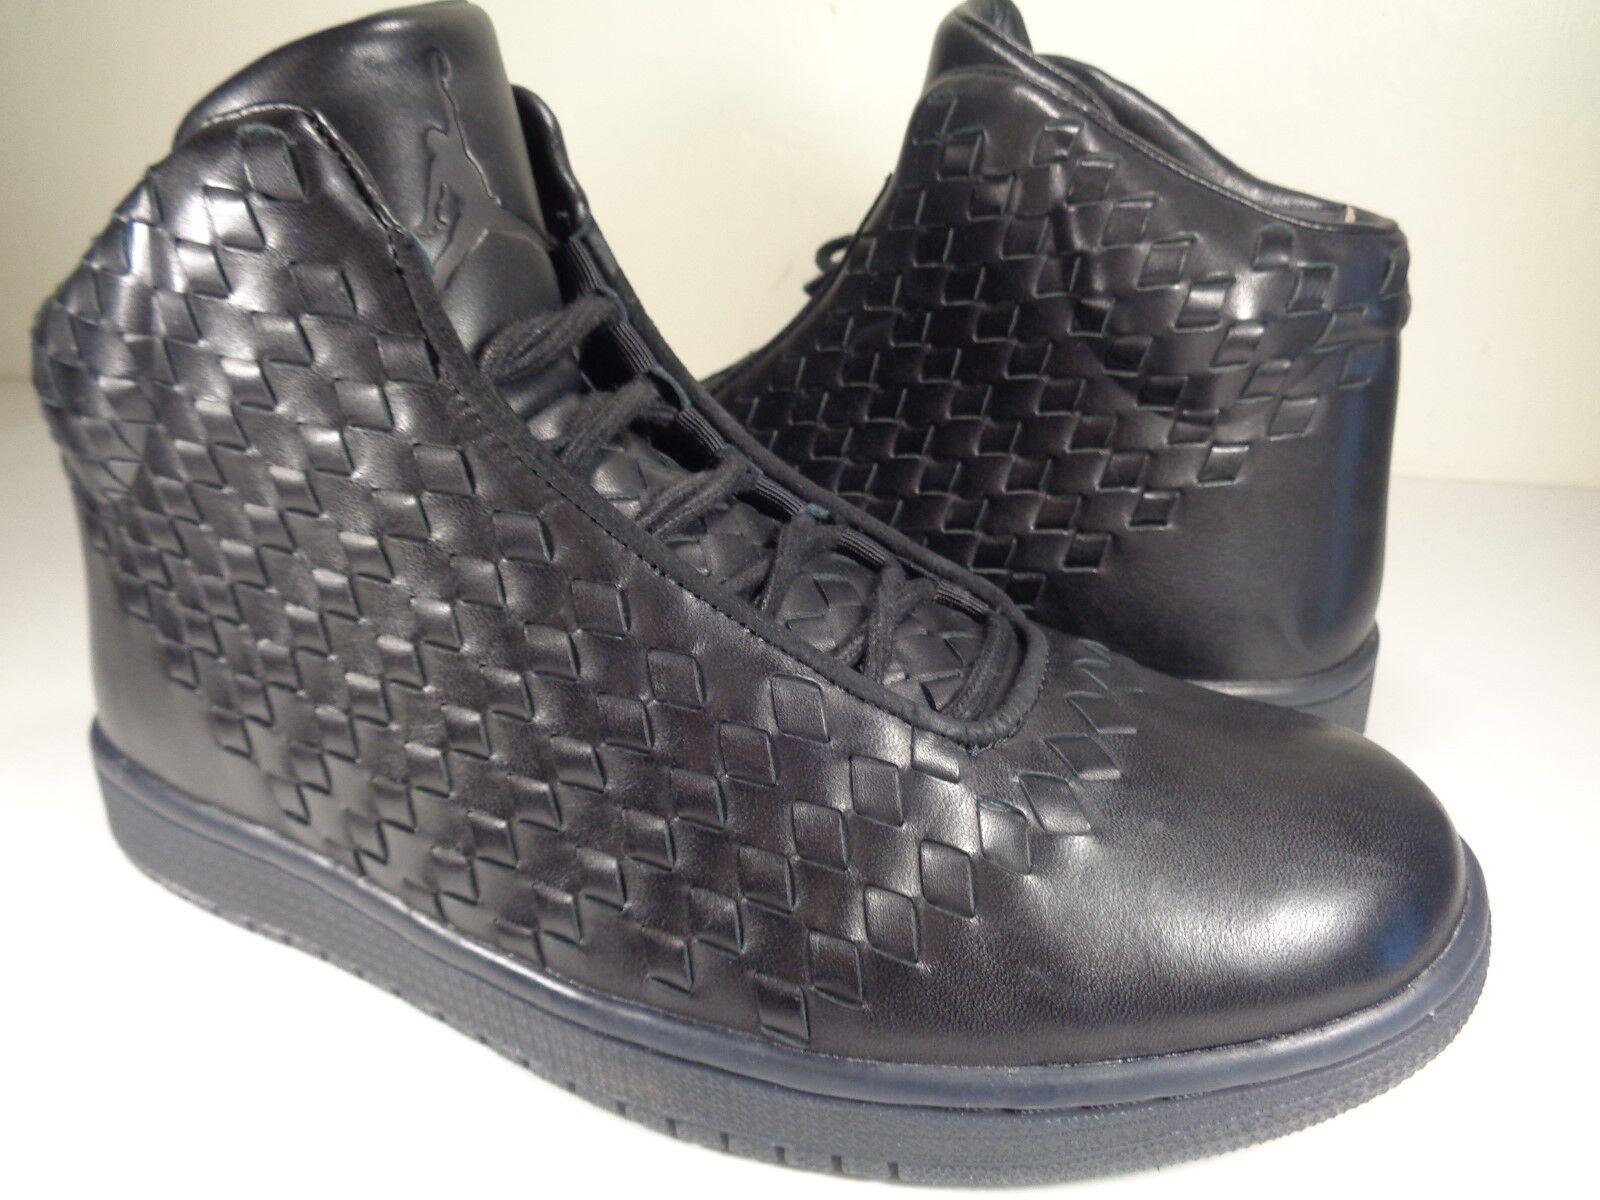 Nike Air Black Jordan Shine Lux Leather Black Air SZ 10.5 (689480-010) 4307d4